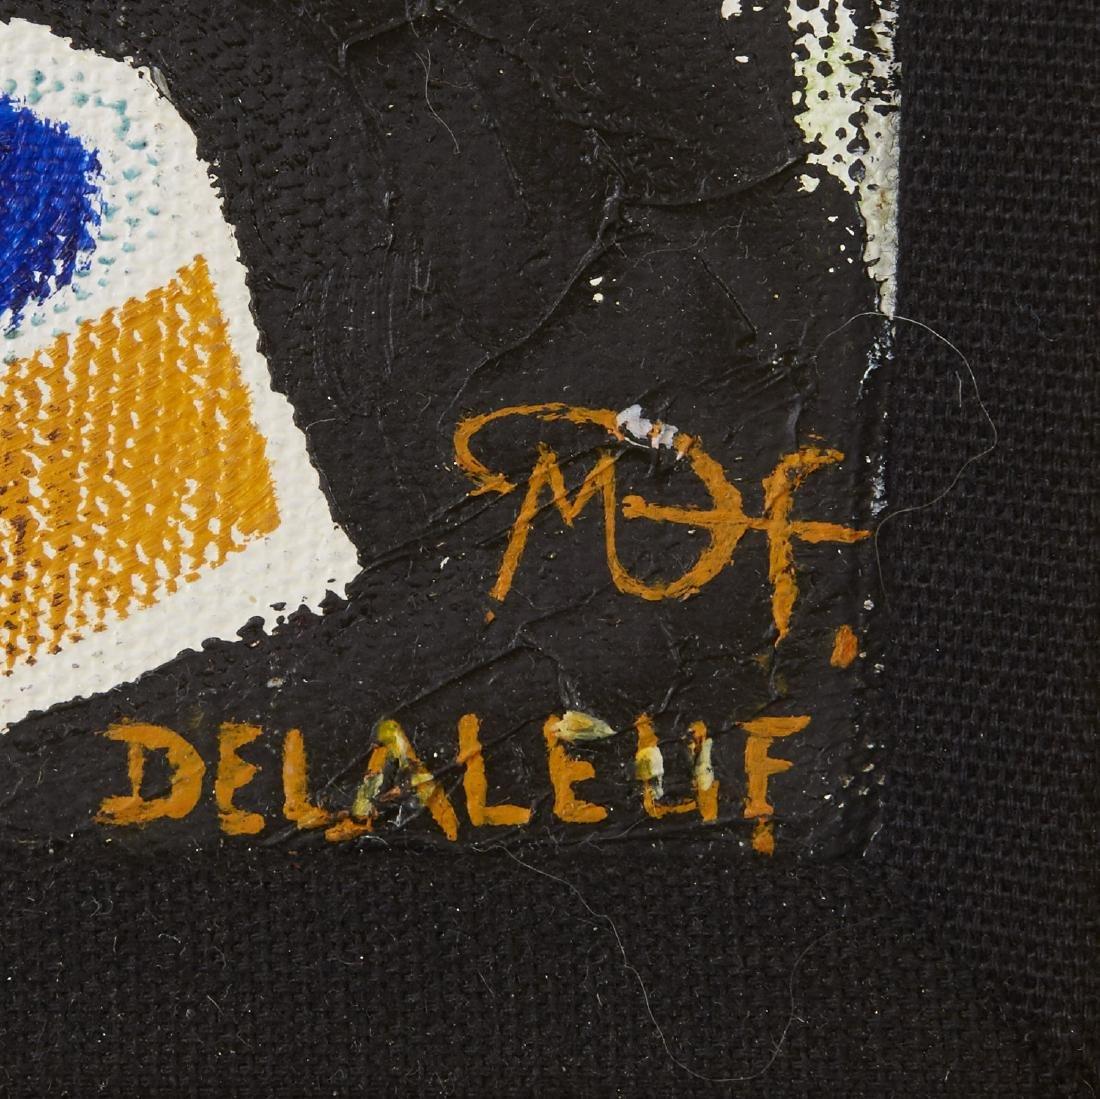 Martine Delaleuf Les Pommes Faraud Oil on Canvas - 3